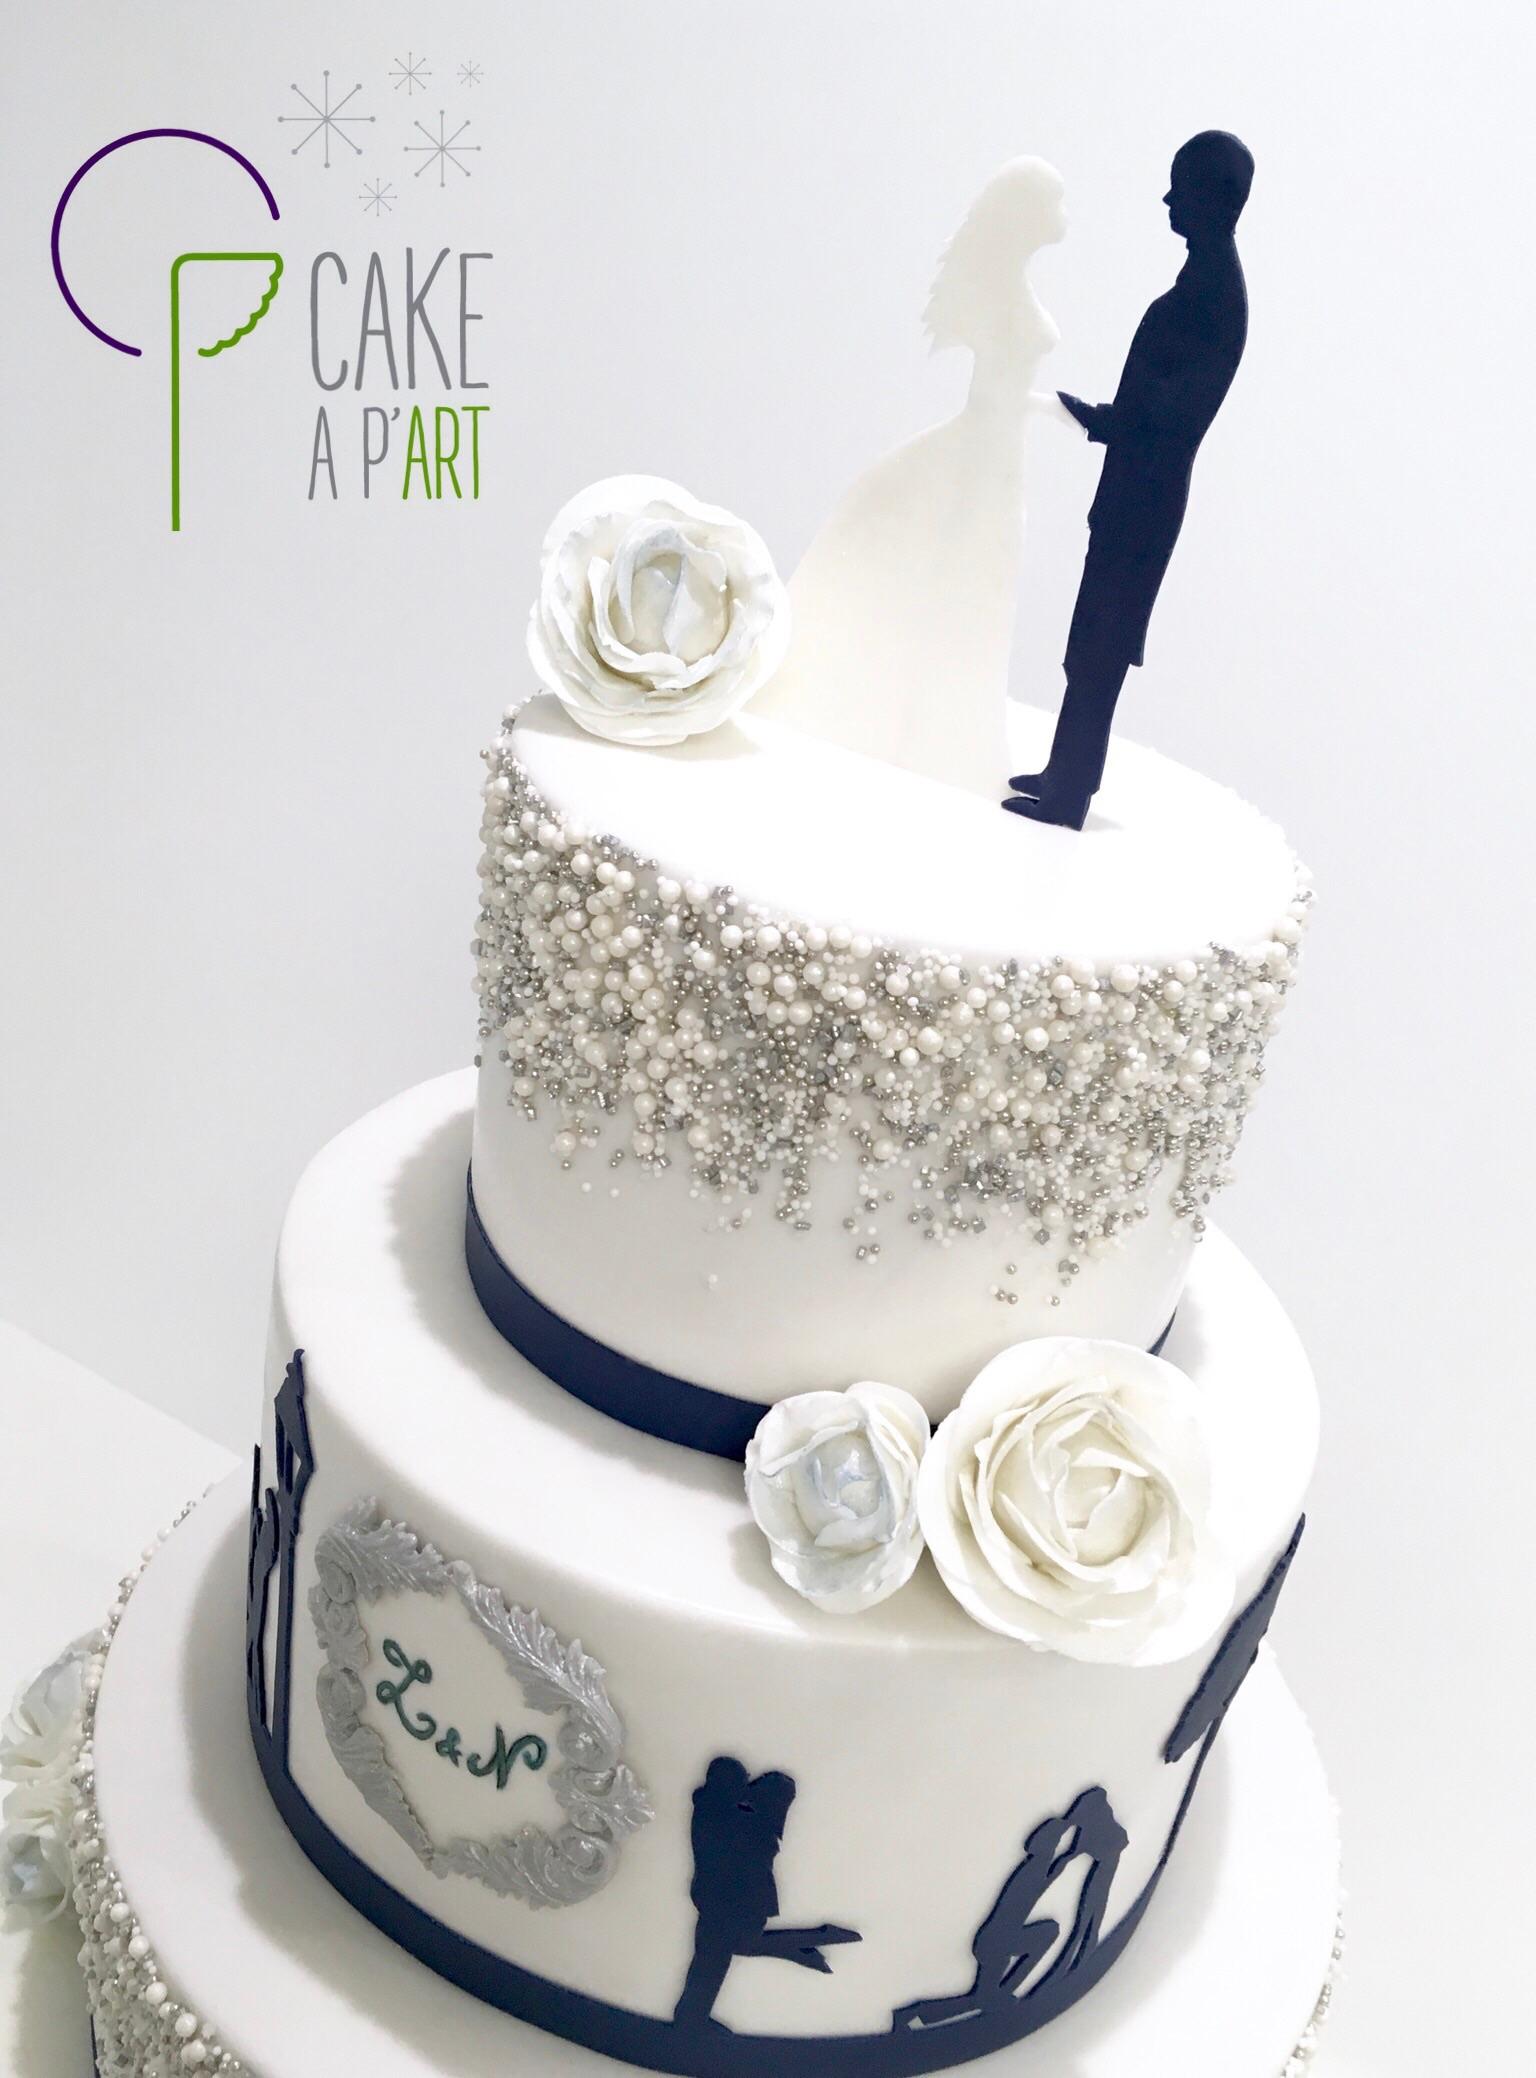 gateau-mariage-silhouette-3-cakeapart